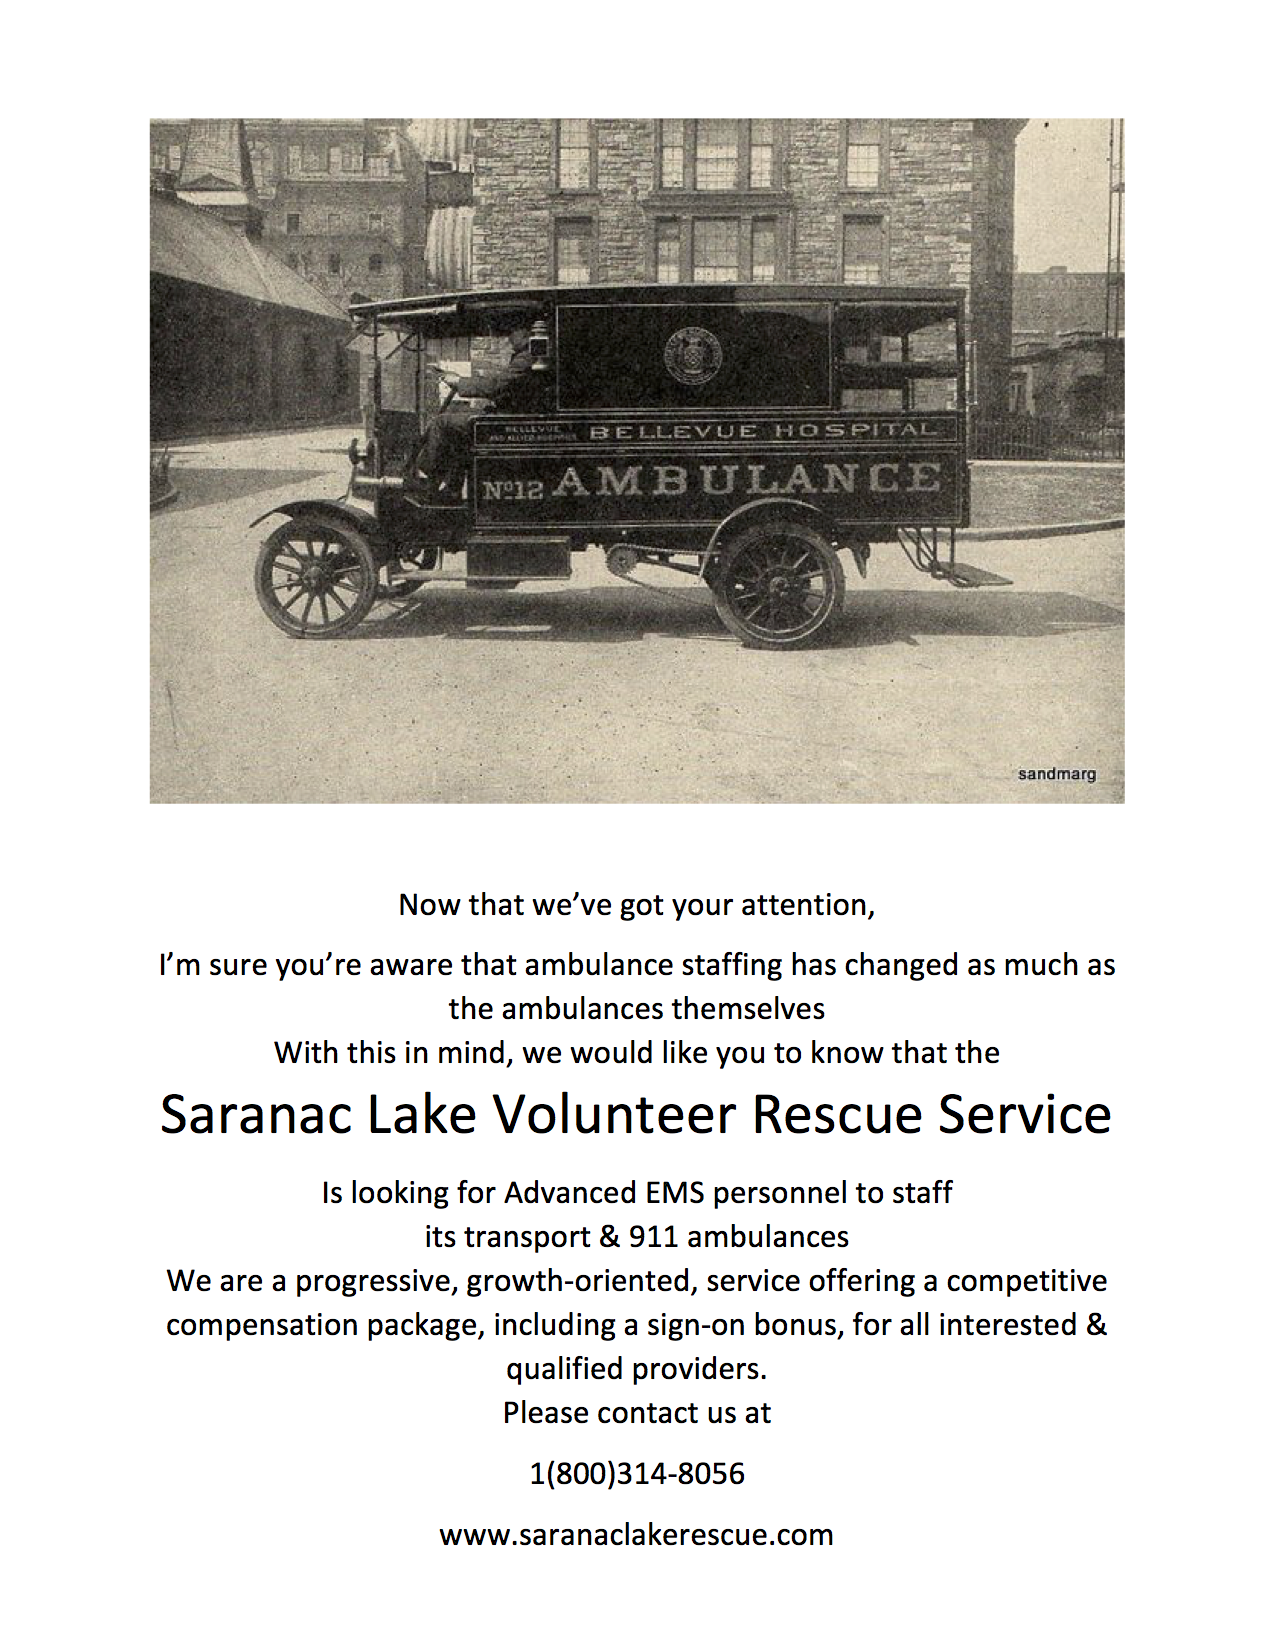 help wanted in saranac lake - mountain lakes regional ems council